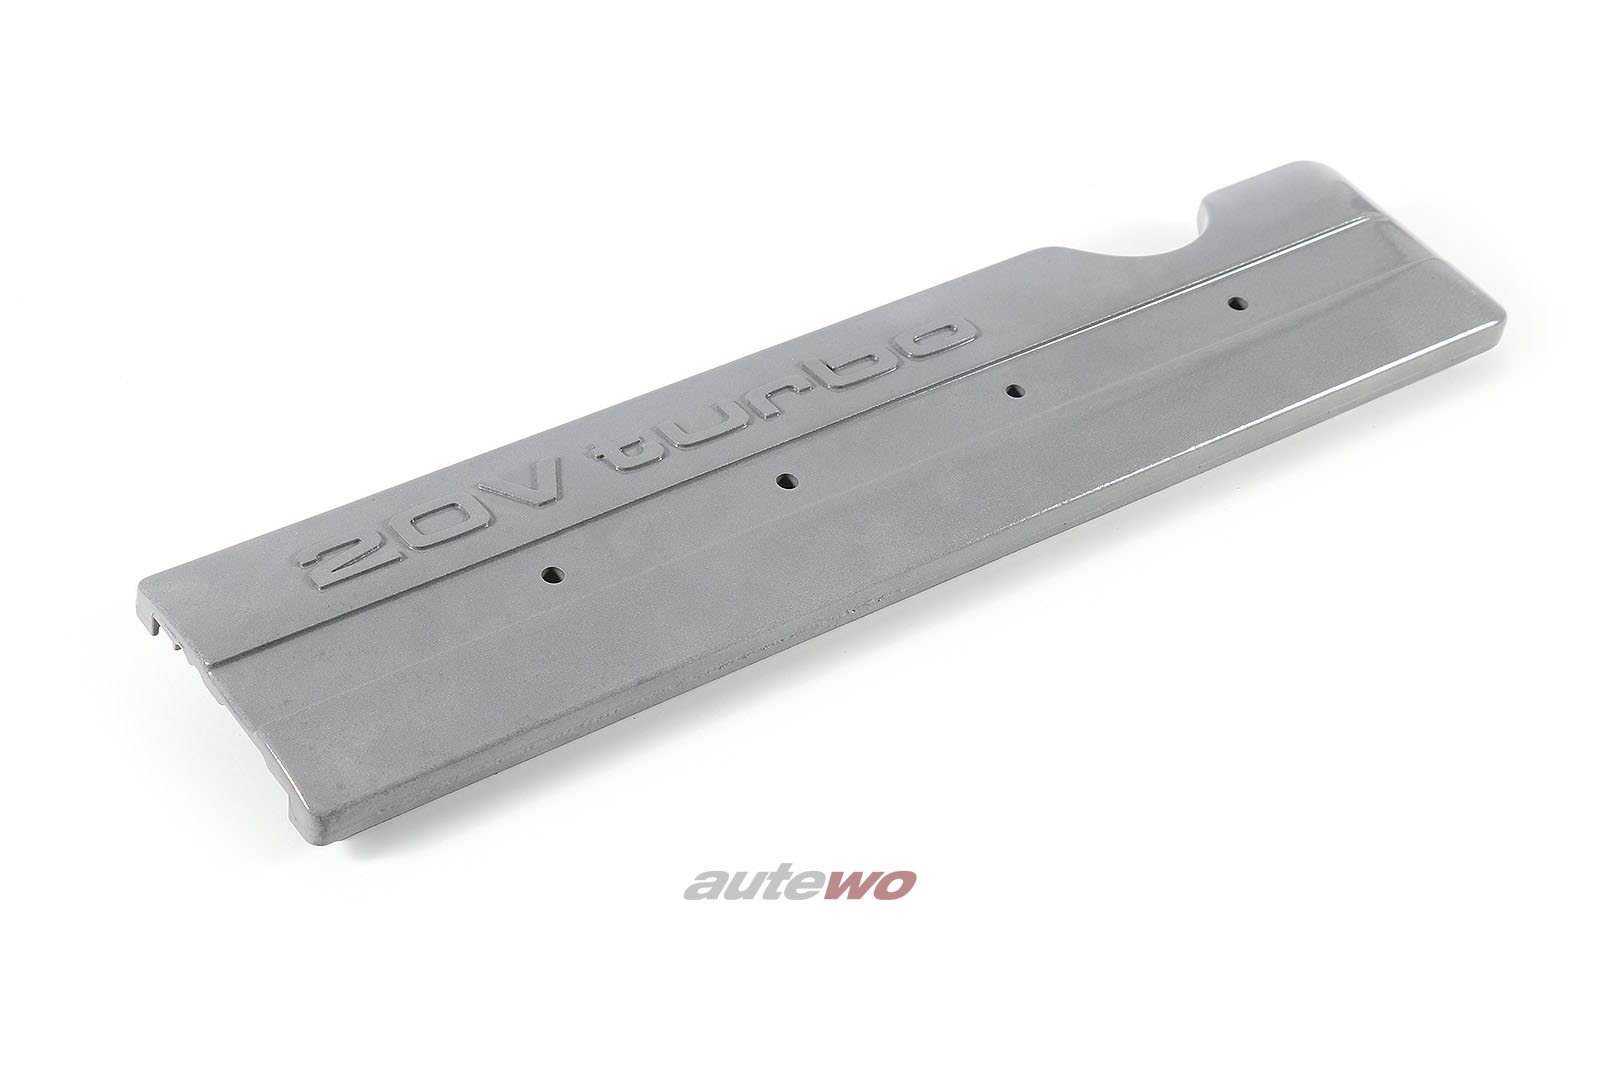 034103724B Audi 80 B4/S2/RS2 P1/S4/S6 C4 20V Turbo Zündspulen-Abdeckung